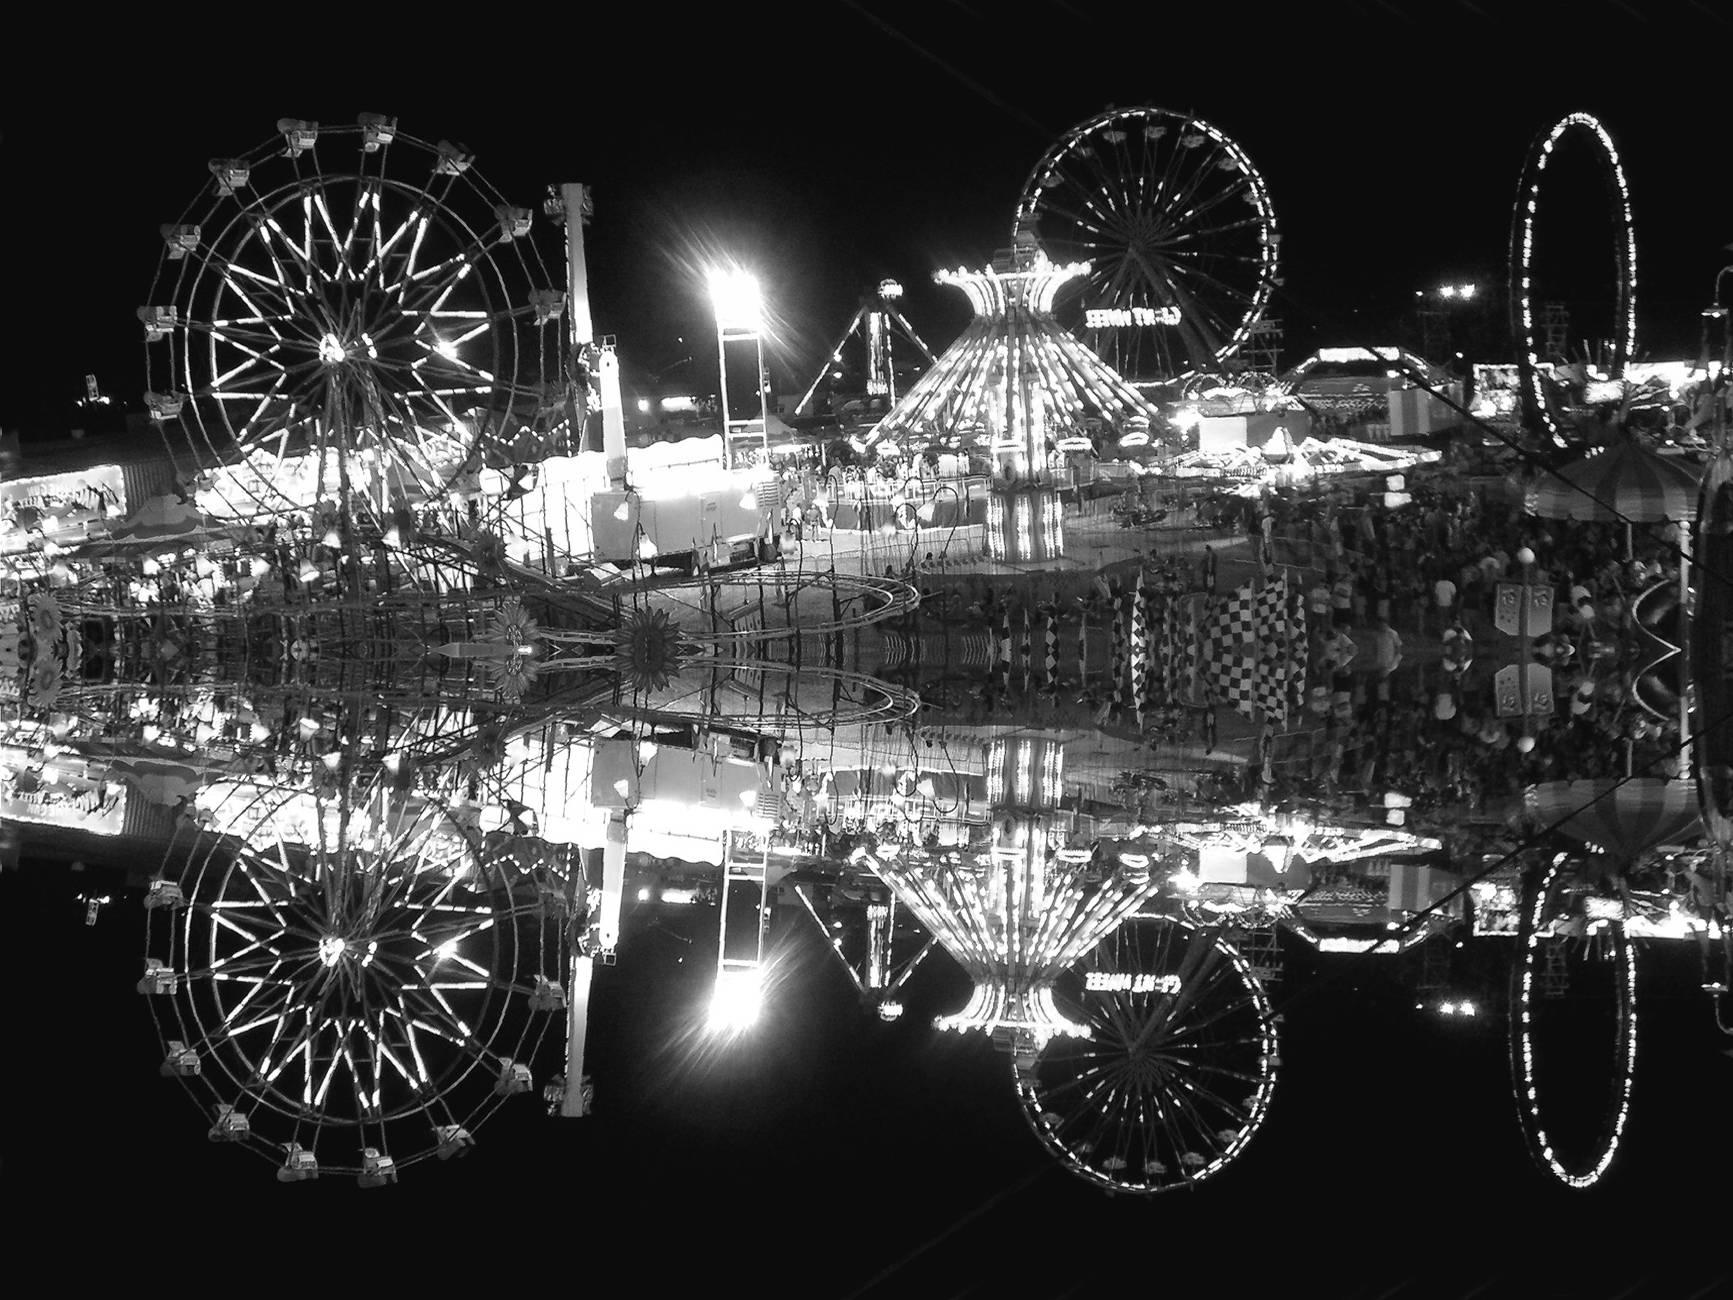 Cycle...county fair .#ello...#d - zygzwurx | ello